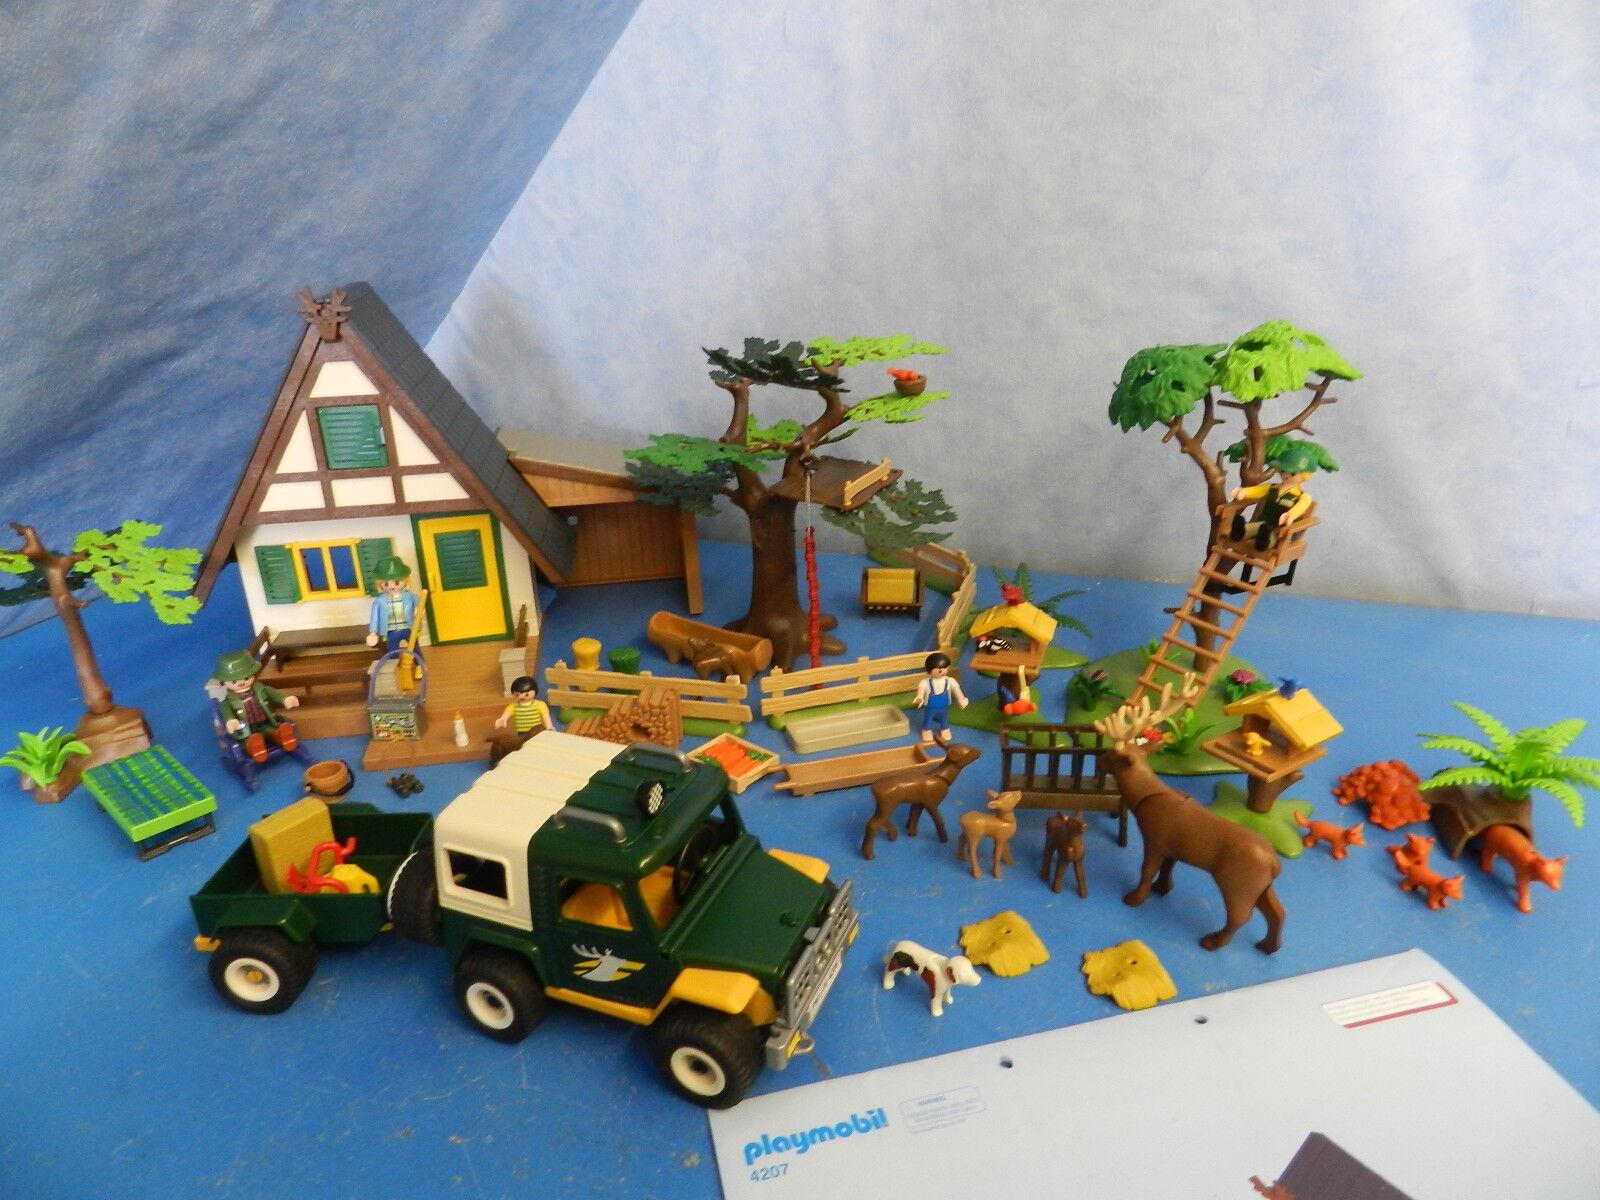 4207 Forsthaus 4206 Förster Jeep 4208 Wildfütterung  Vogelhaus Playmobil 6825